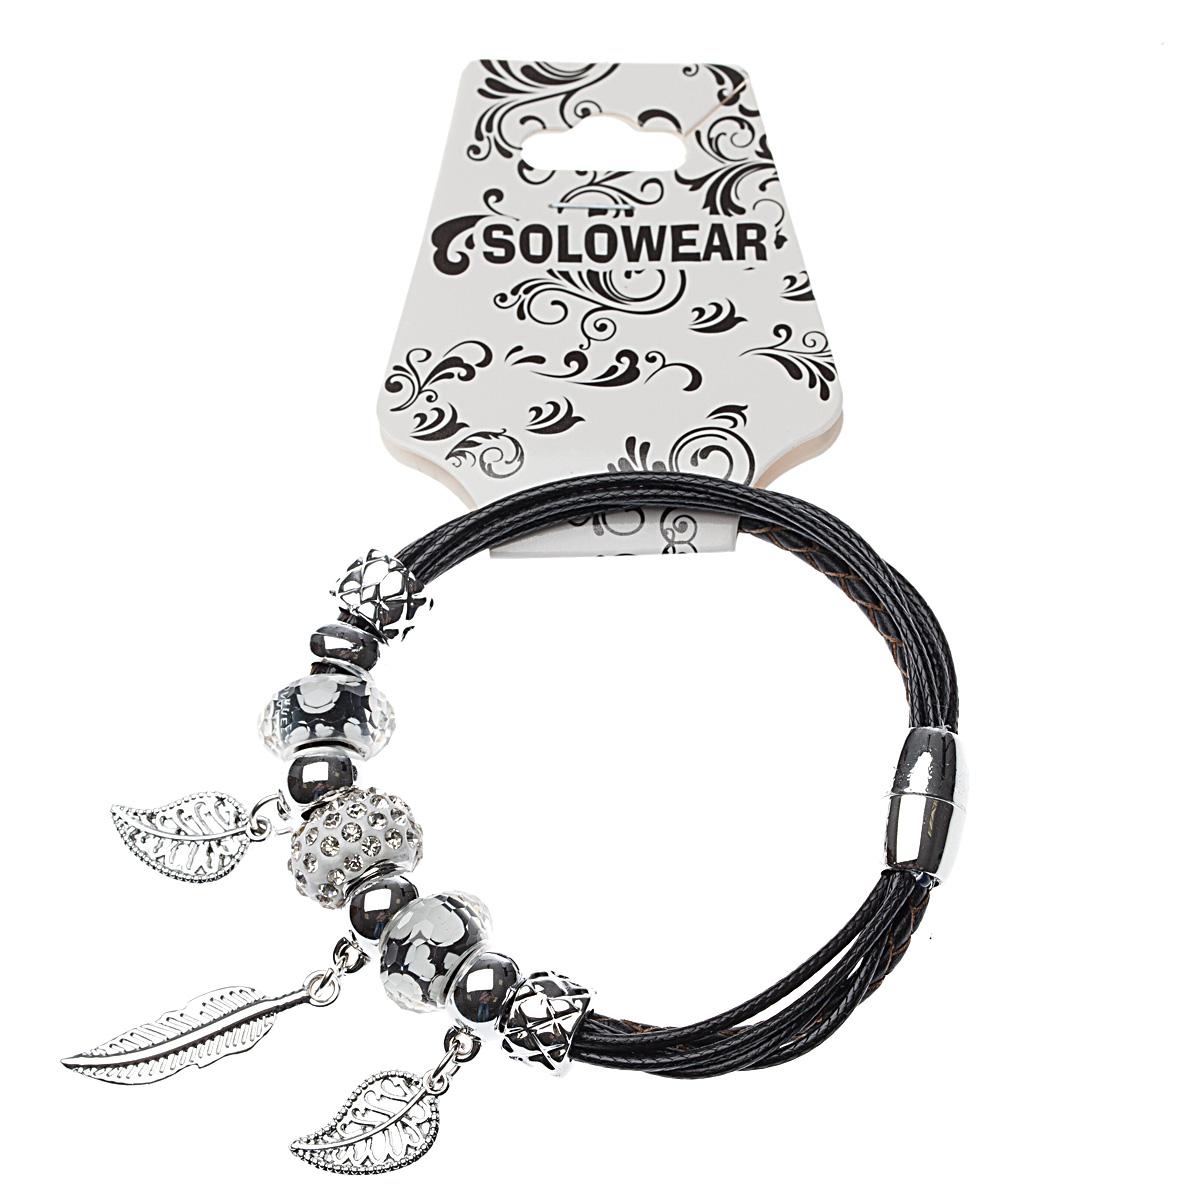 Браслет Solowear, 4620-16 браслет solowear 4620 7